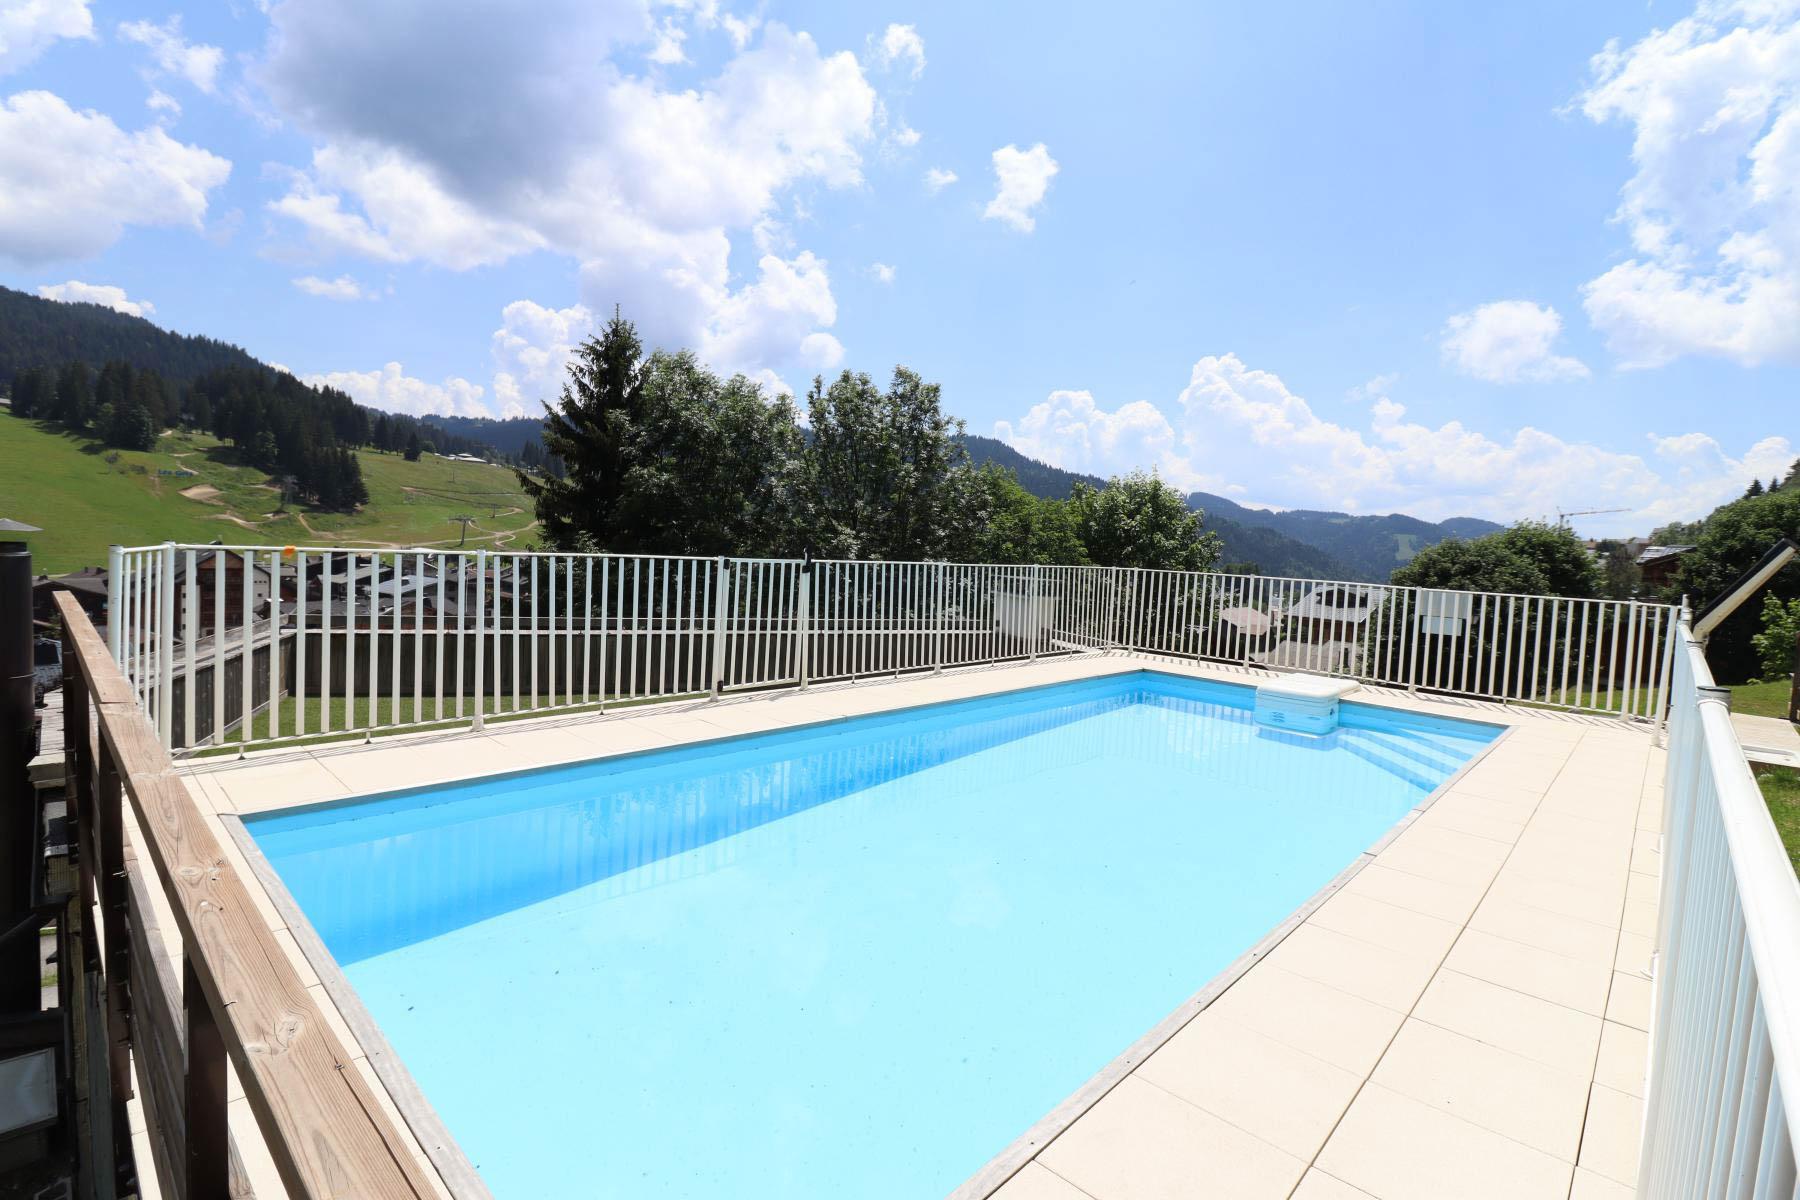 Studio appt 822 Swimming Pool